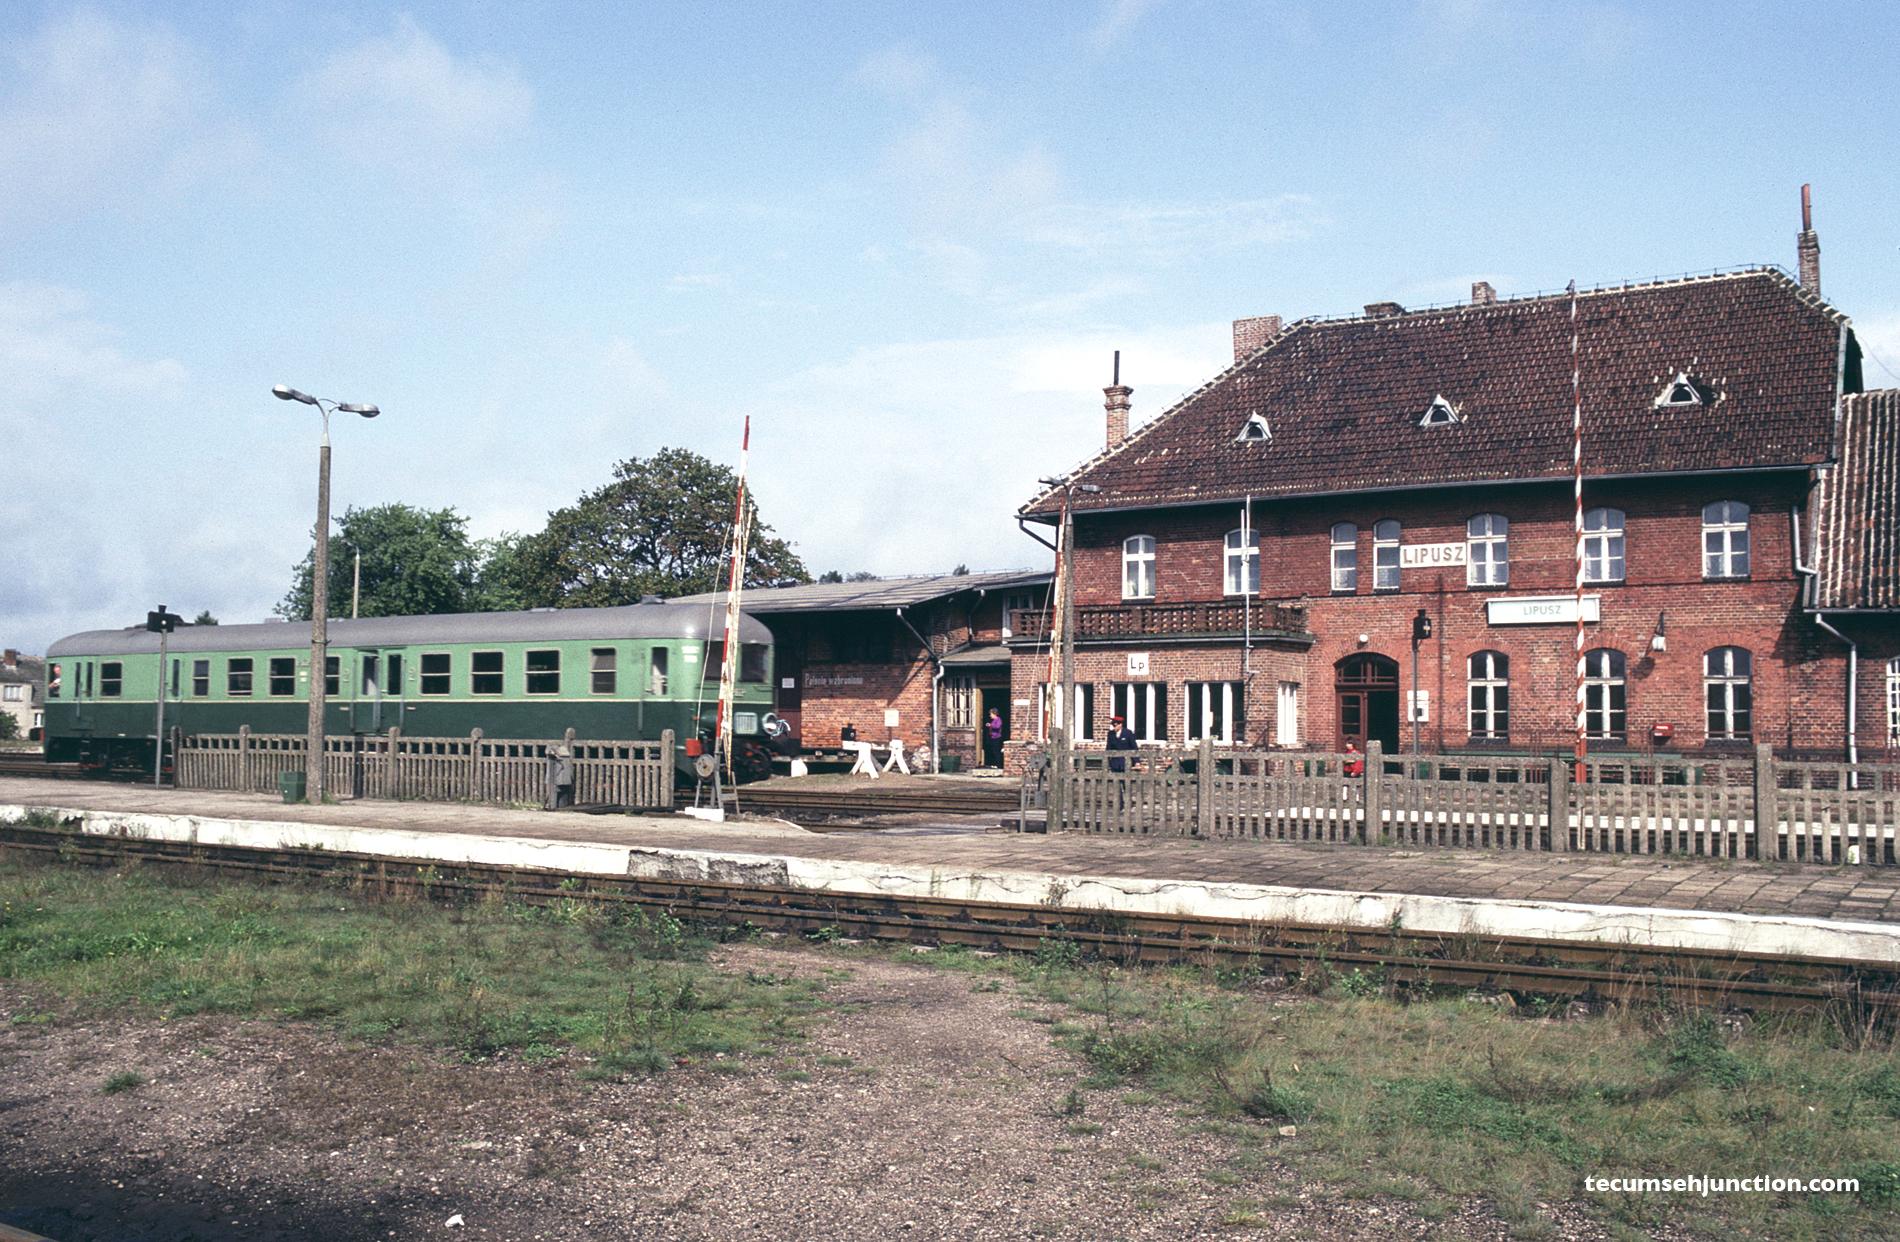 PKP SN61 rail car sits at the station in Lipusz, Poland